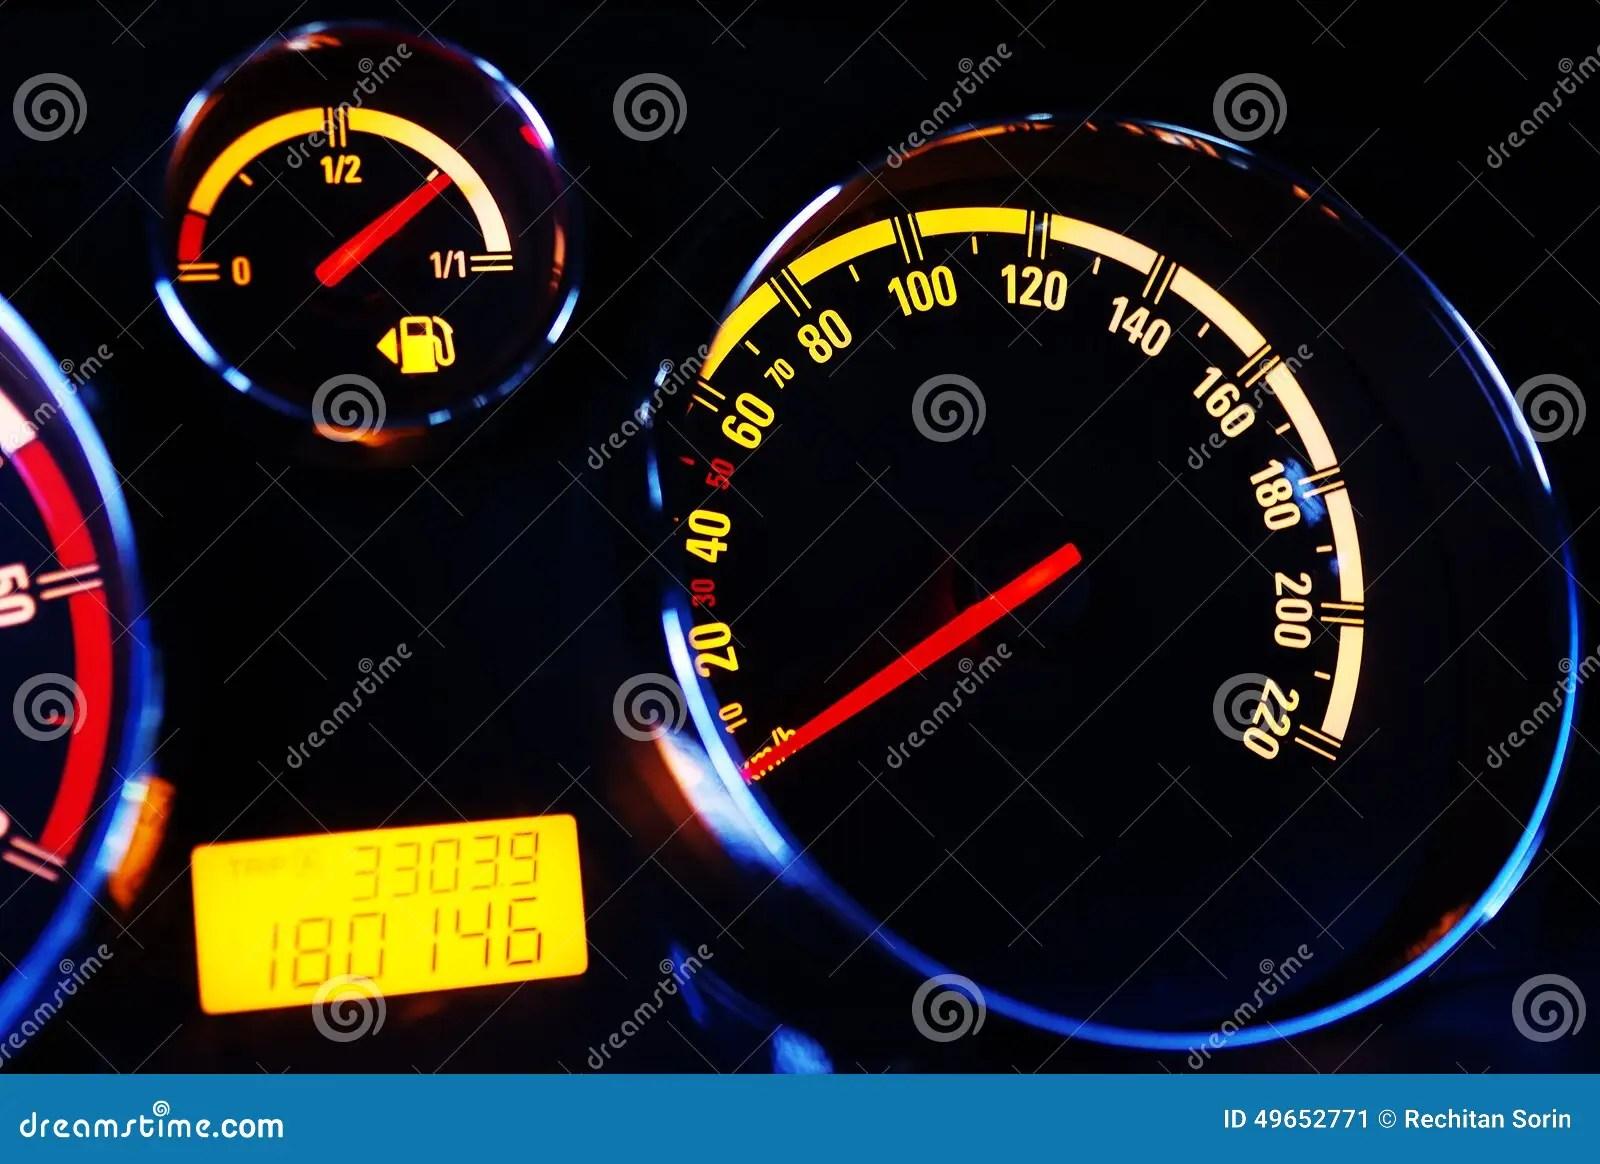 Car Instrument Panel Stock Image Image Of Illustration